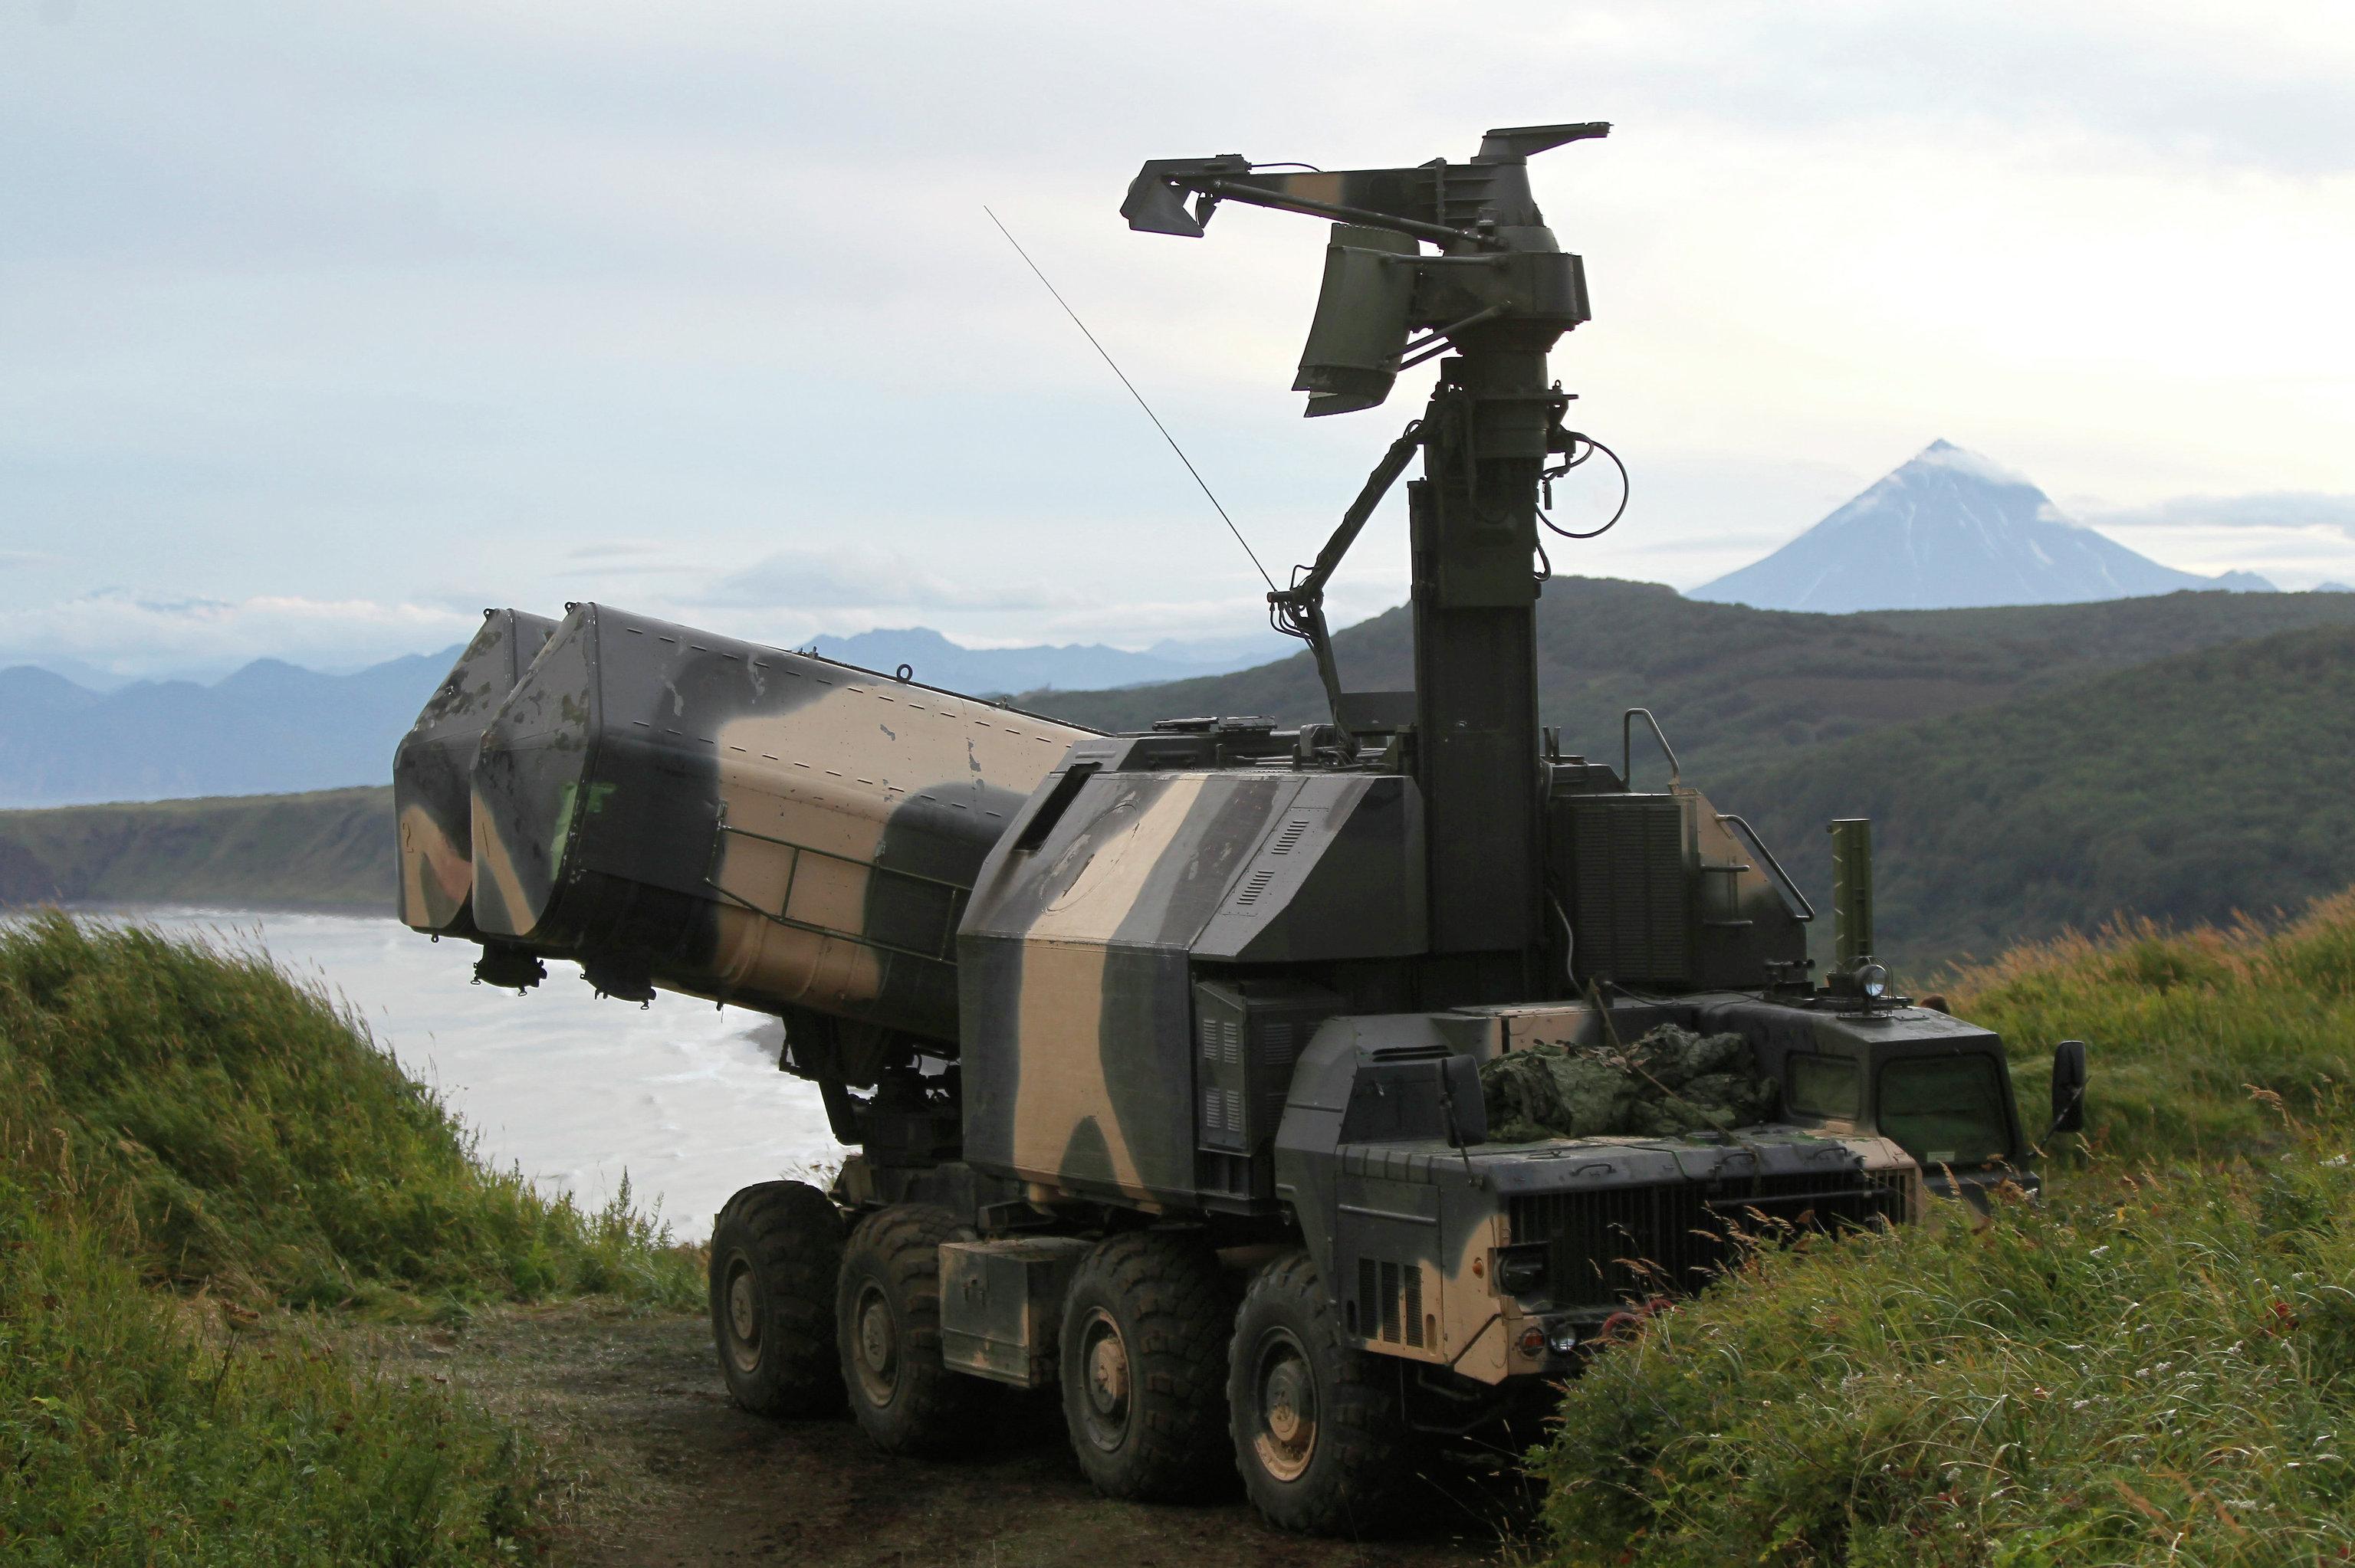 Complexo móvel de mísseis russo Rubezh (Fronteira)